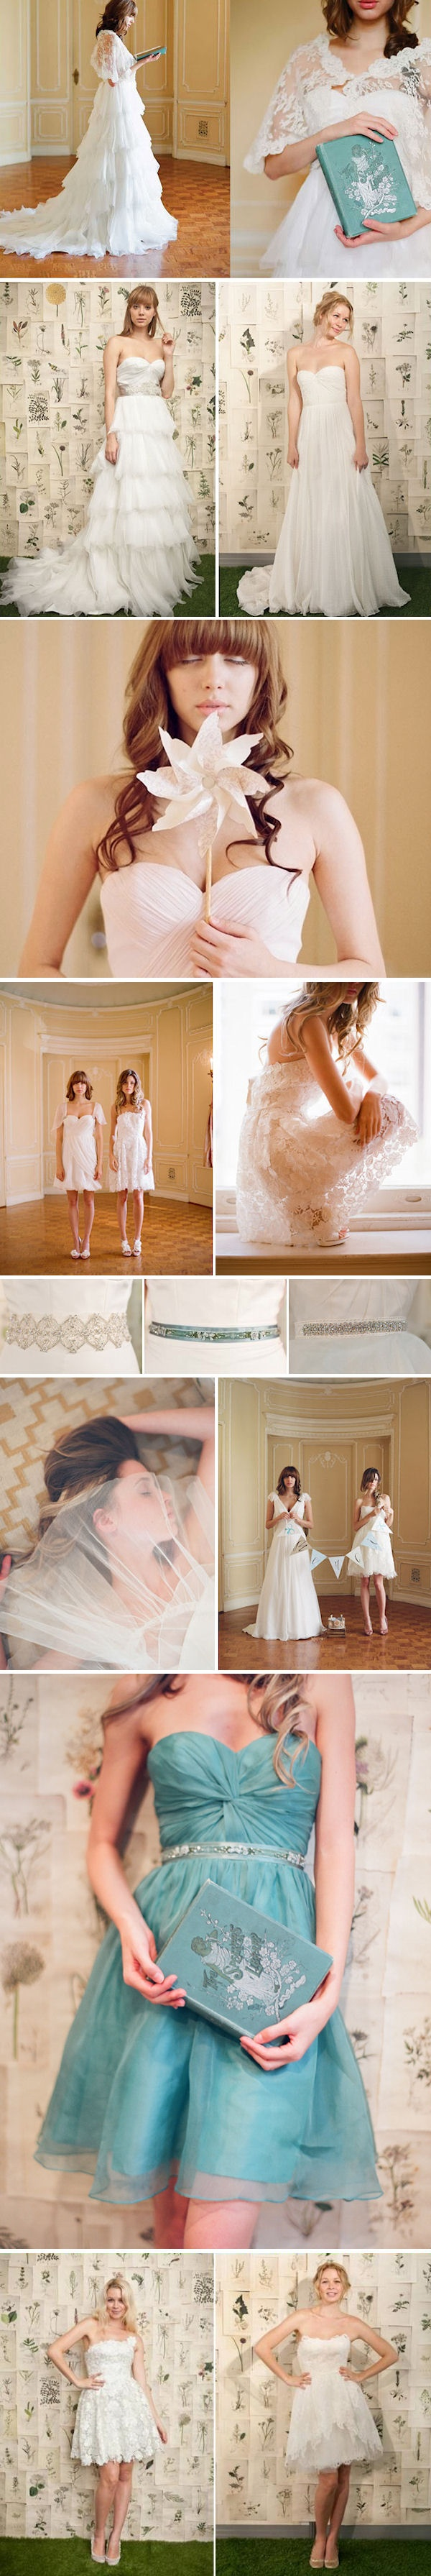 I <3 the Blue Dress!!! Modern Wedding Dresses Ivy & Aster